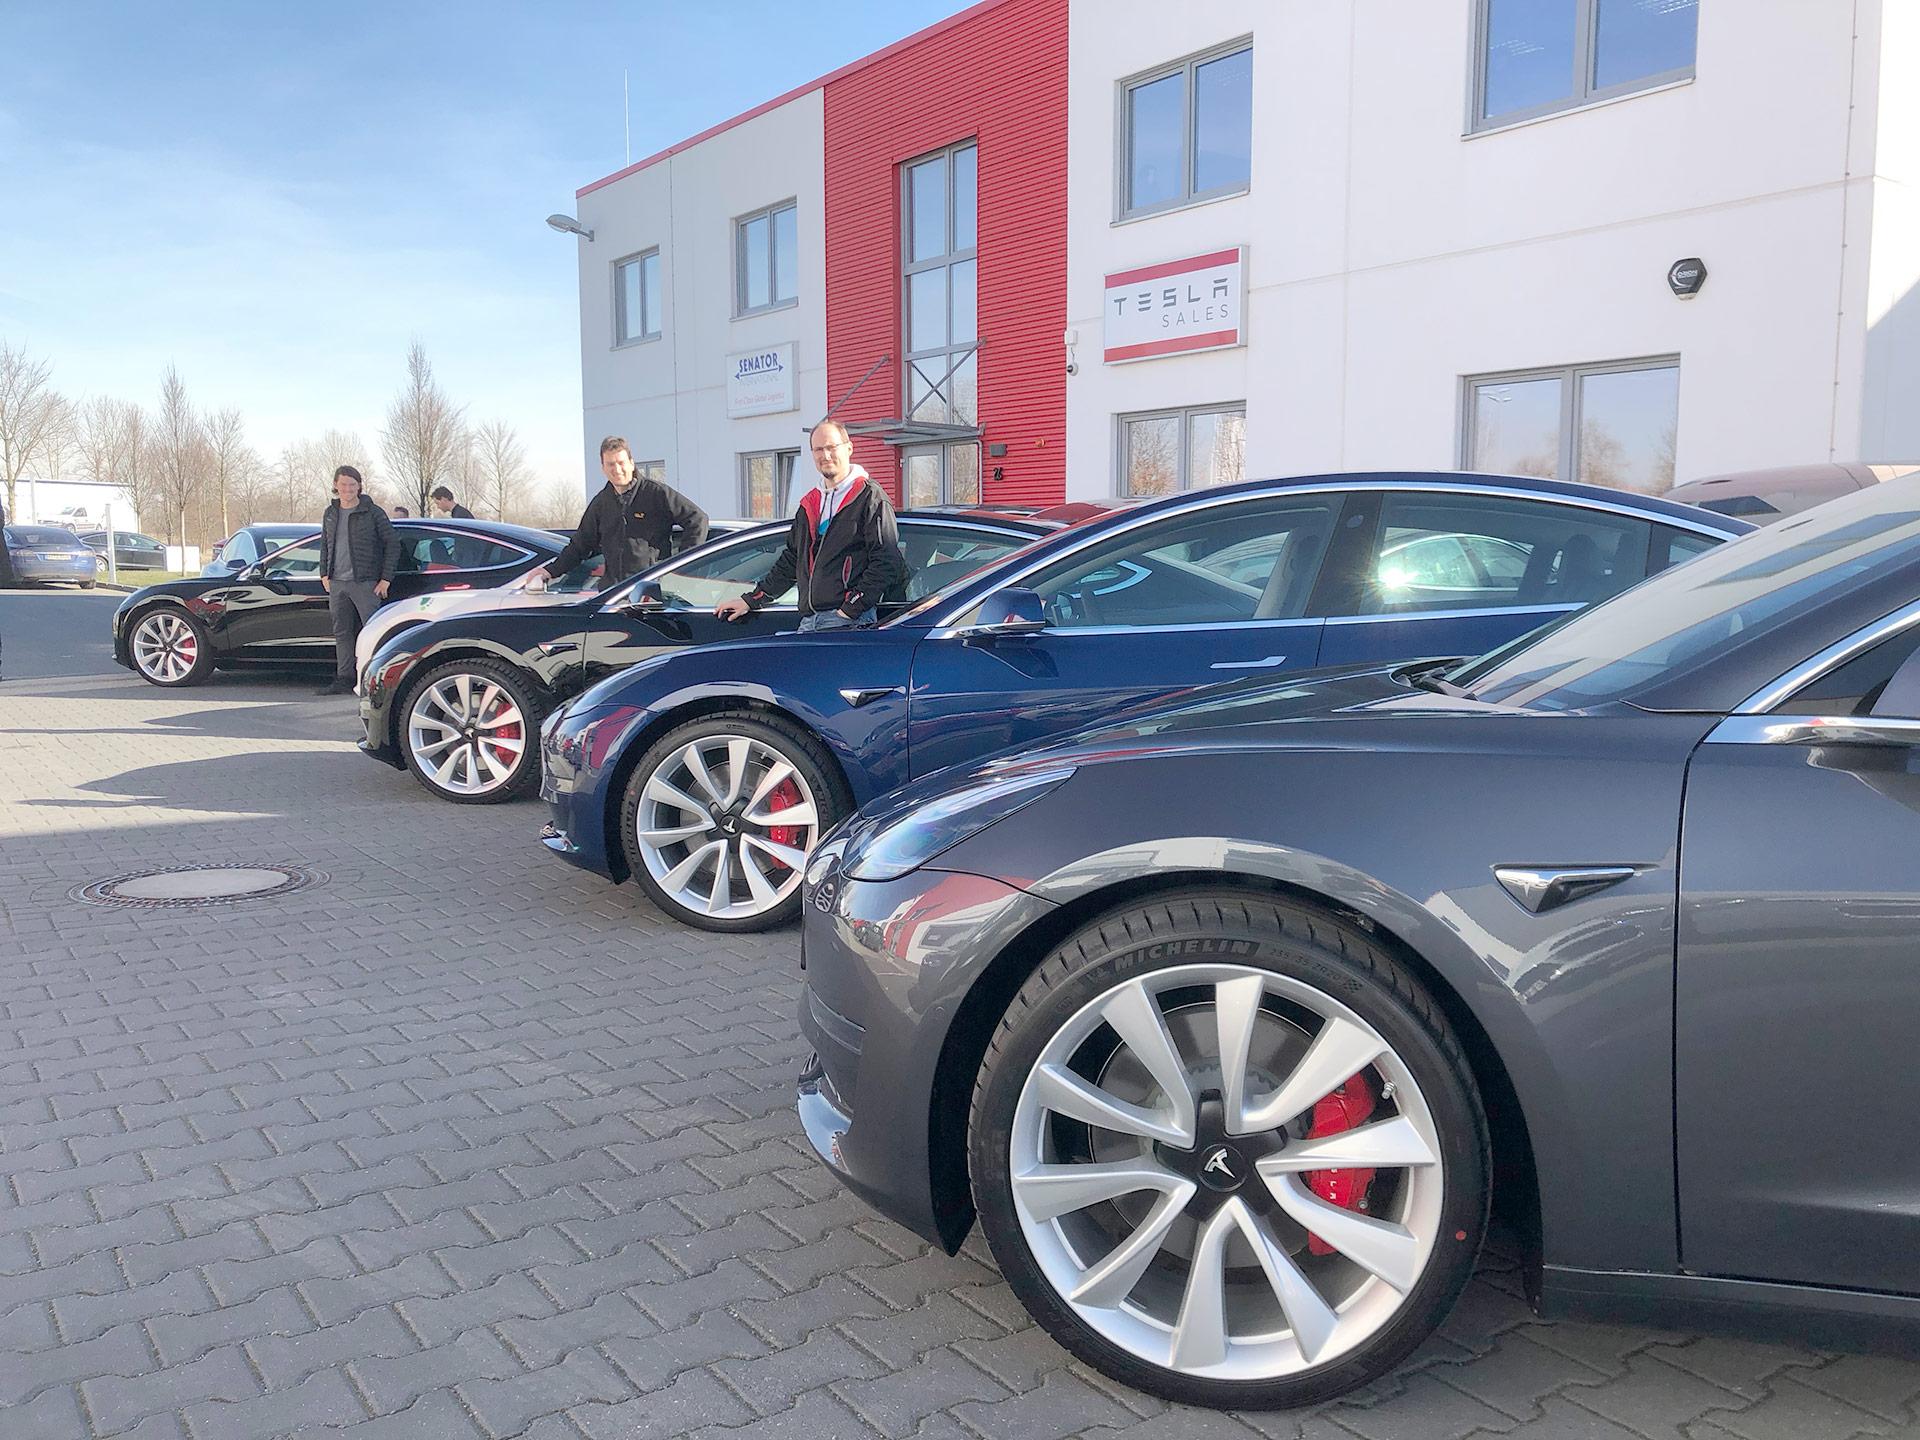 Germany's top car rental company buys 100 Tesla Model 3 EVs